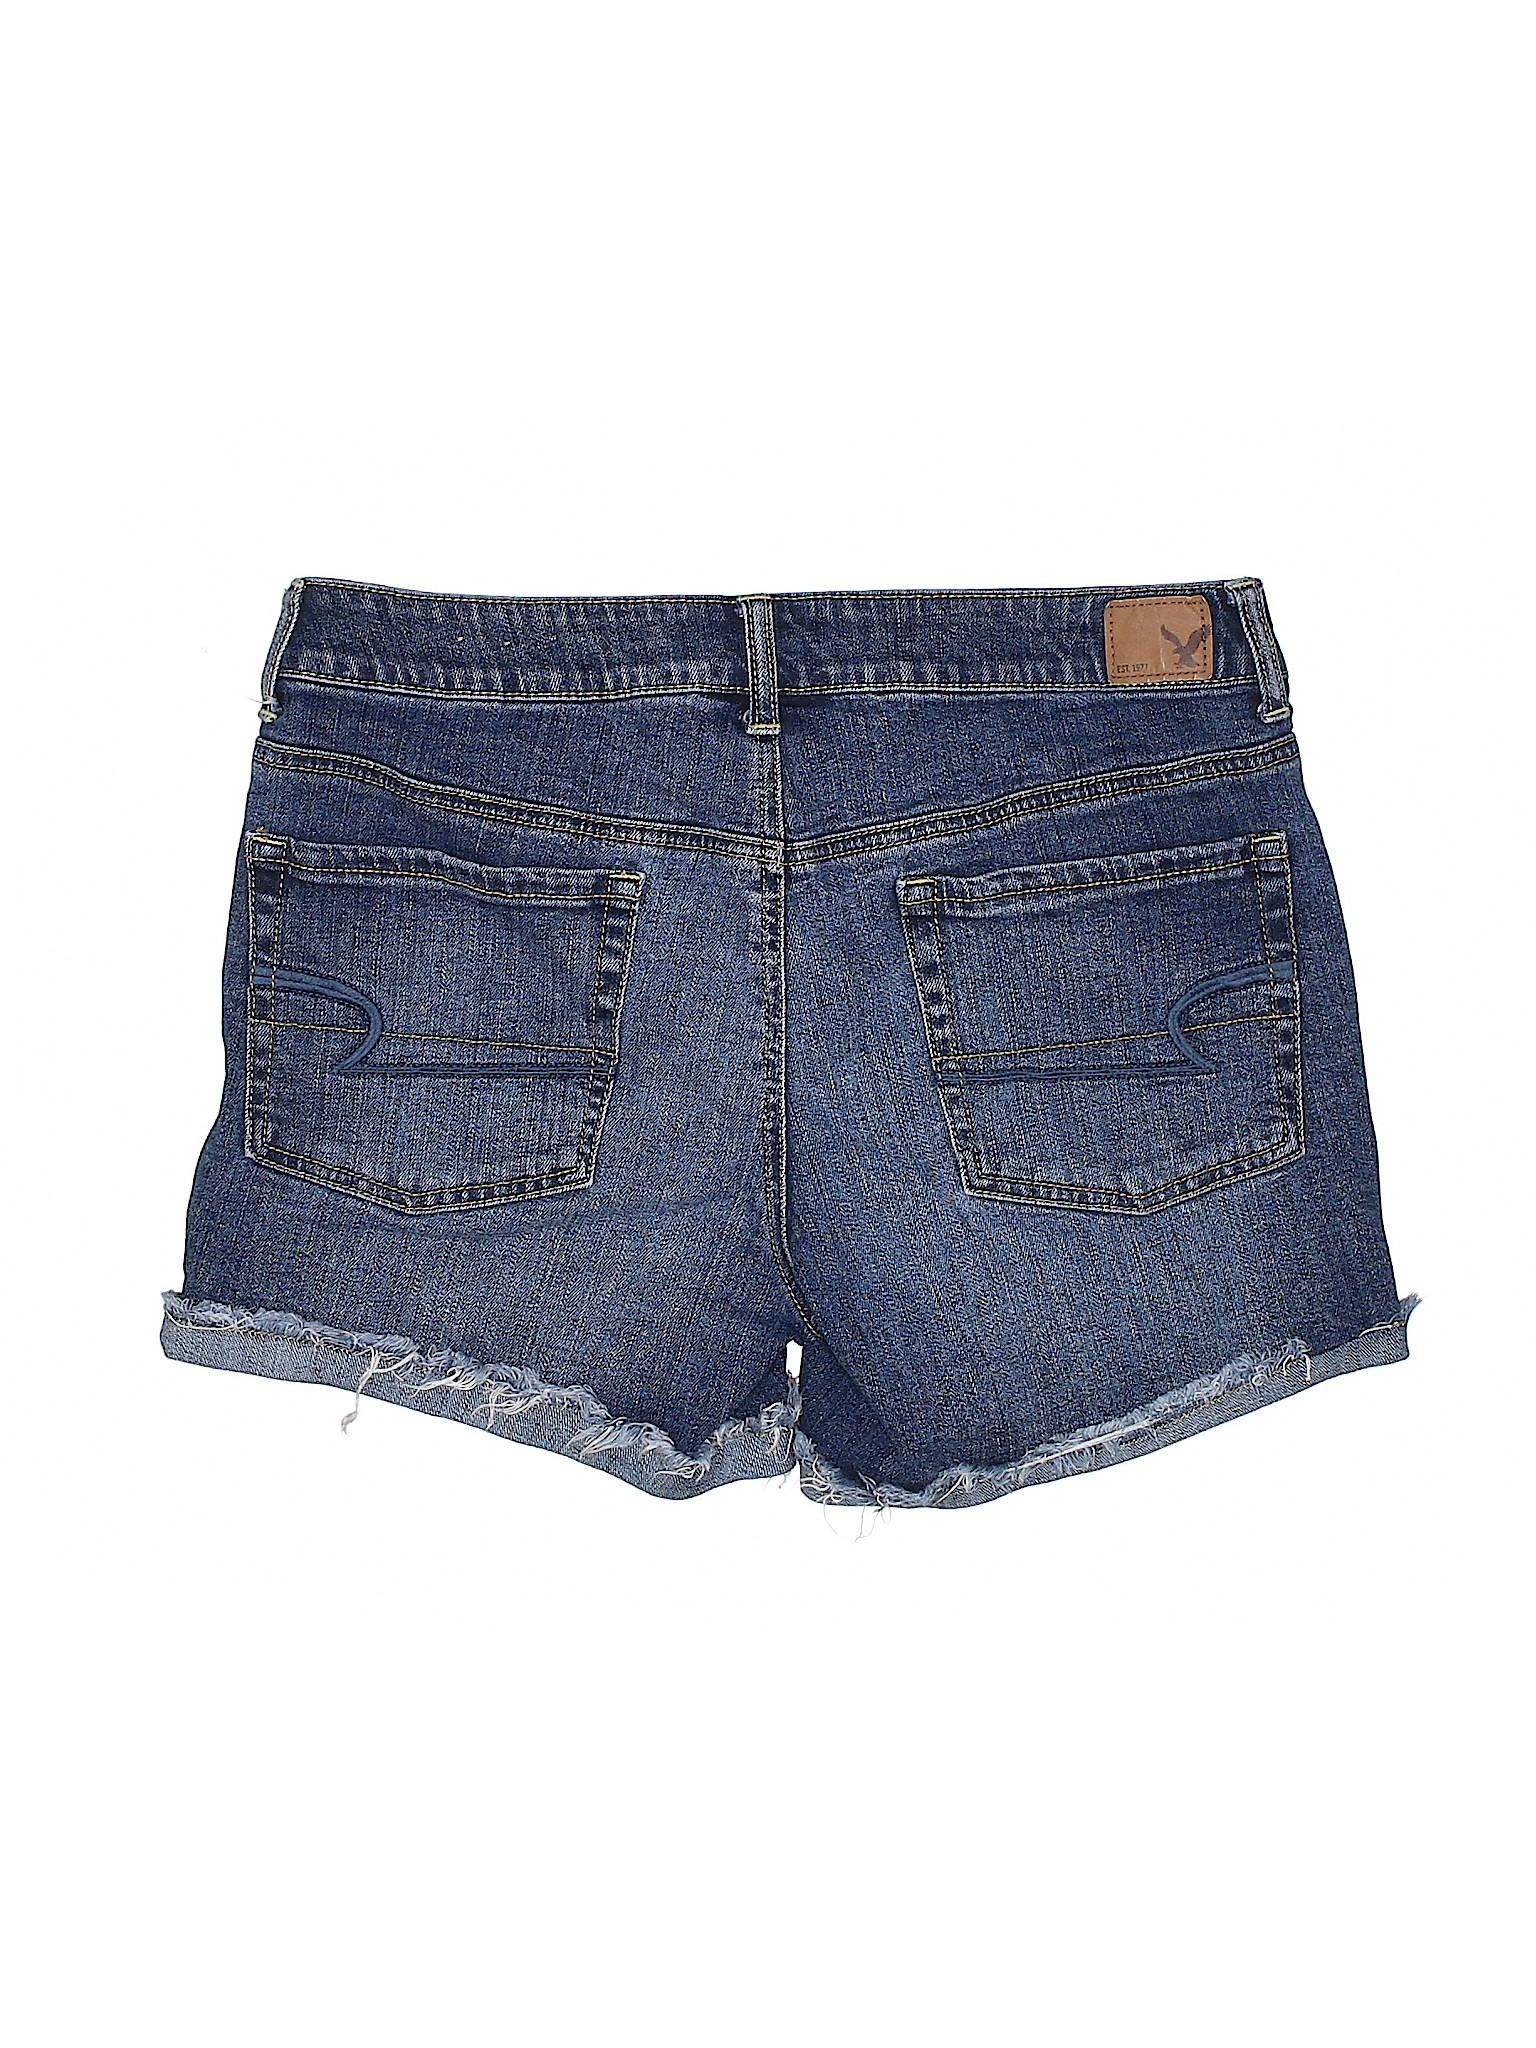 Outfitters Eagle American Boutique Denim Shorts gqRPxgpw